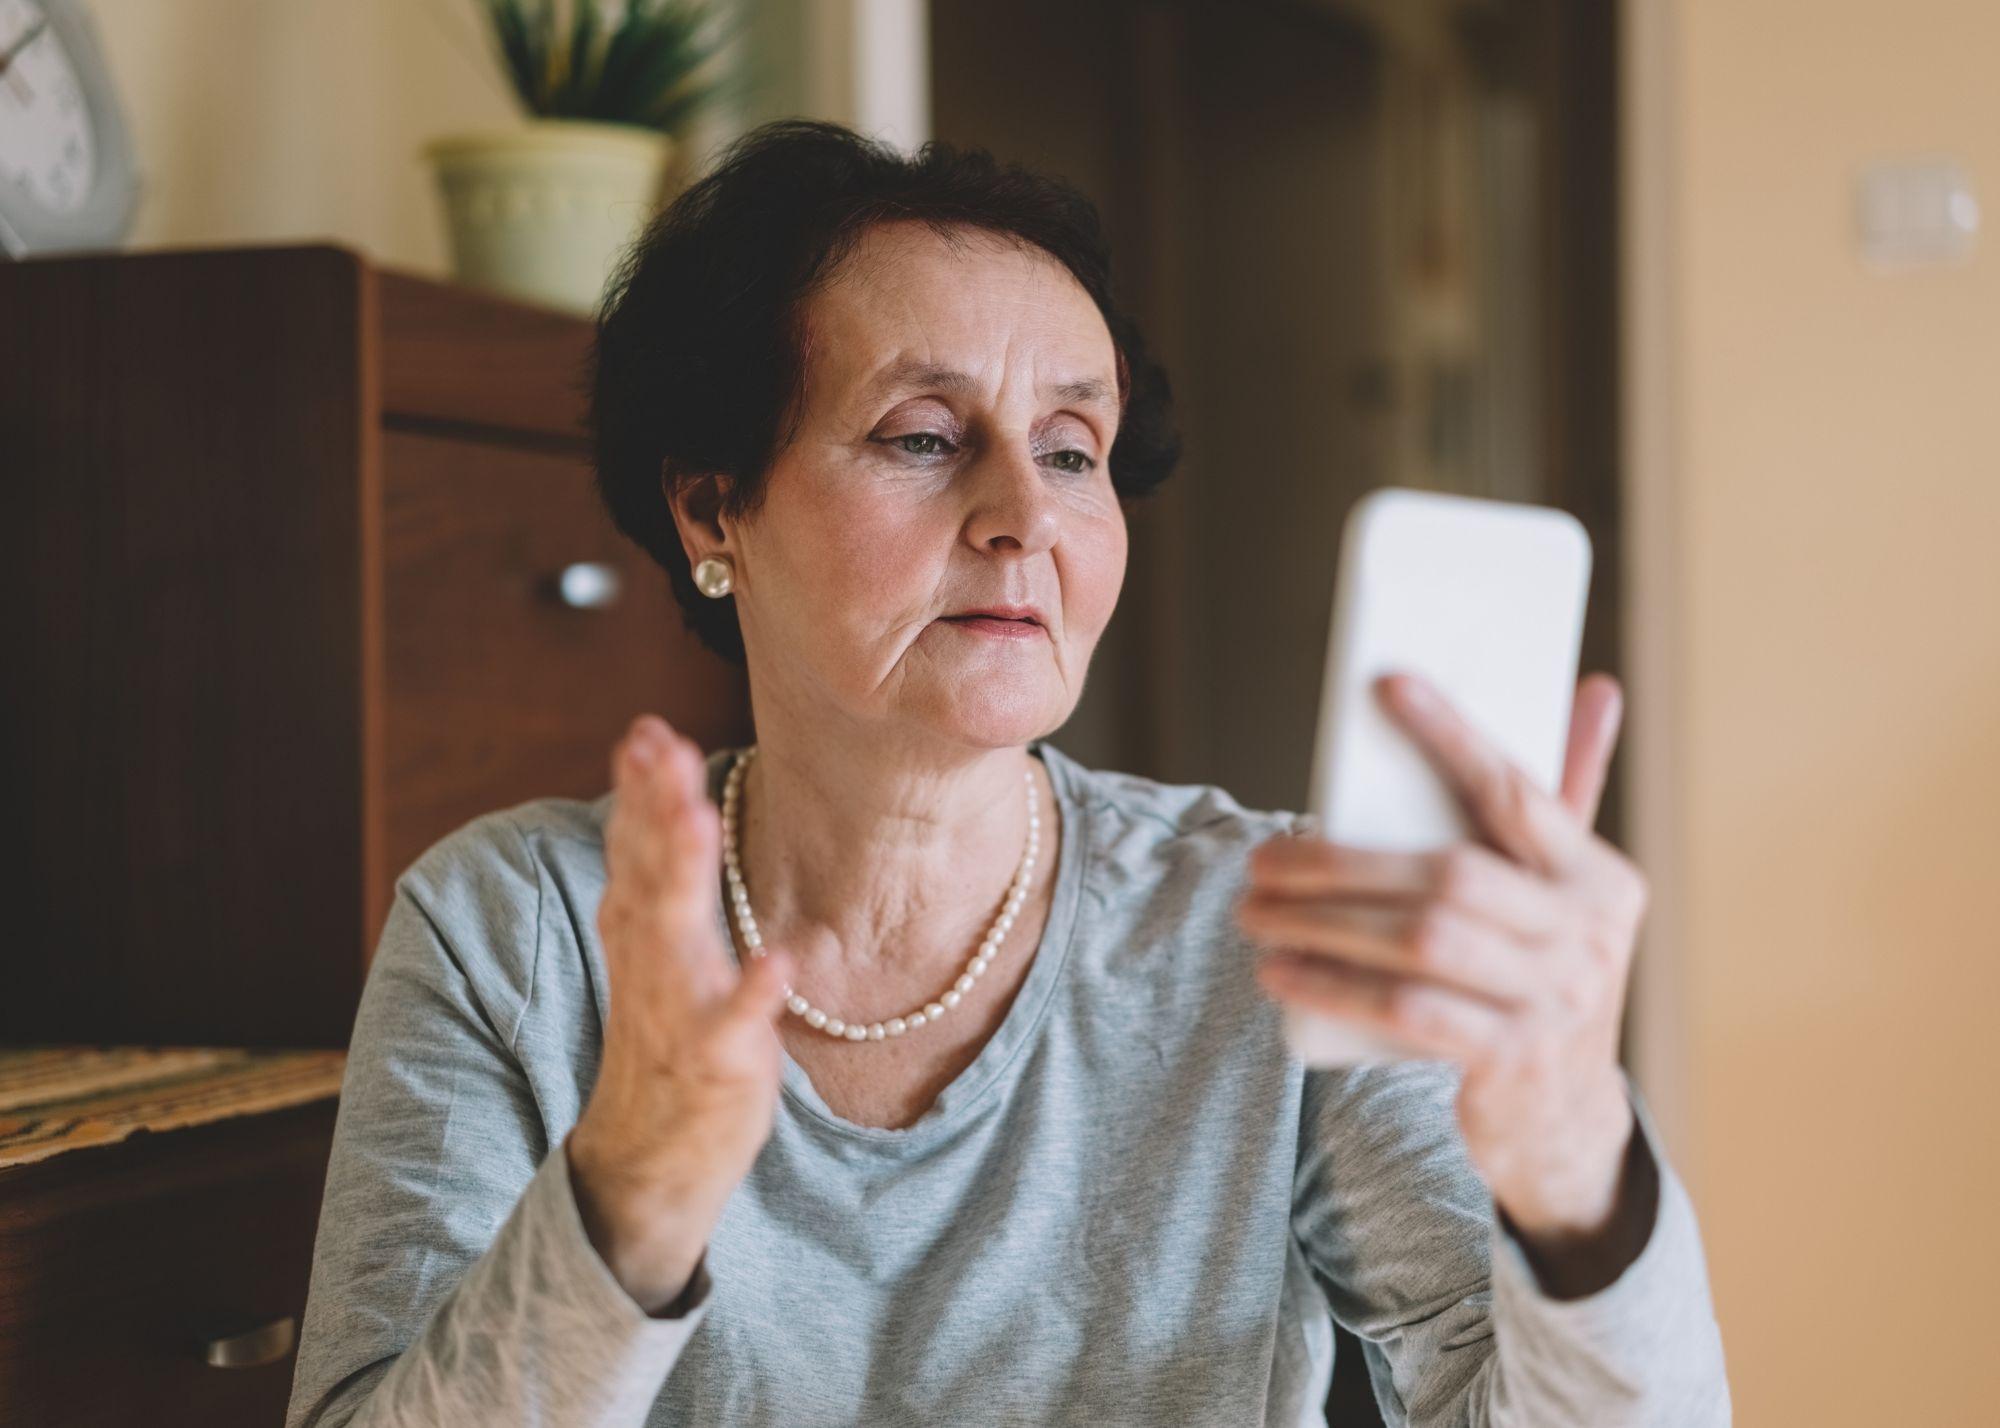 woman recording video on phone